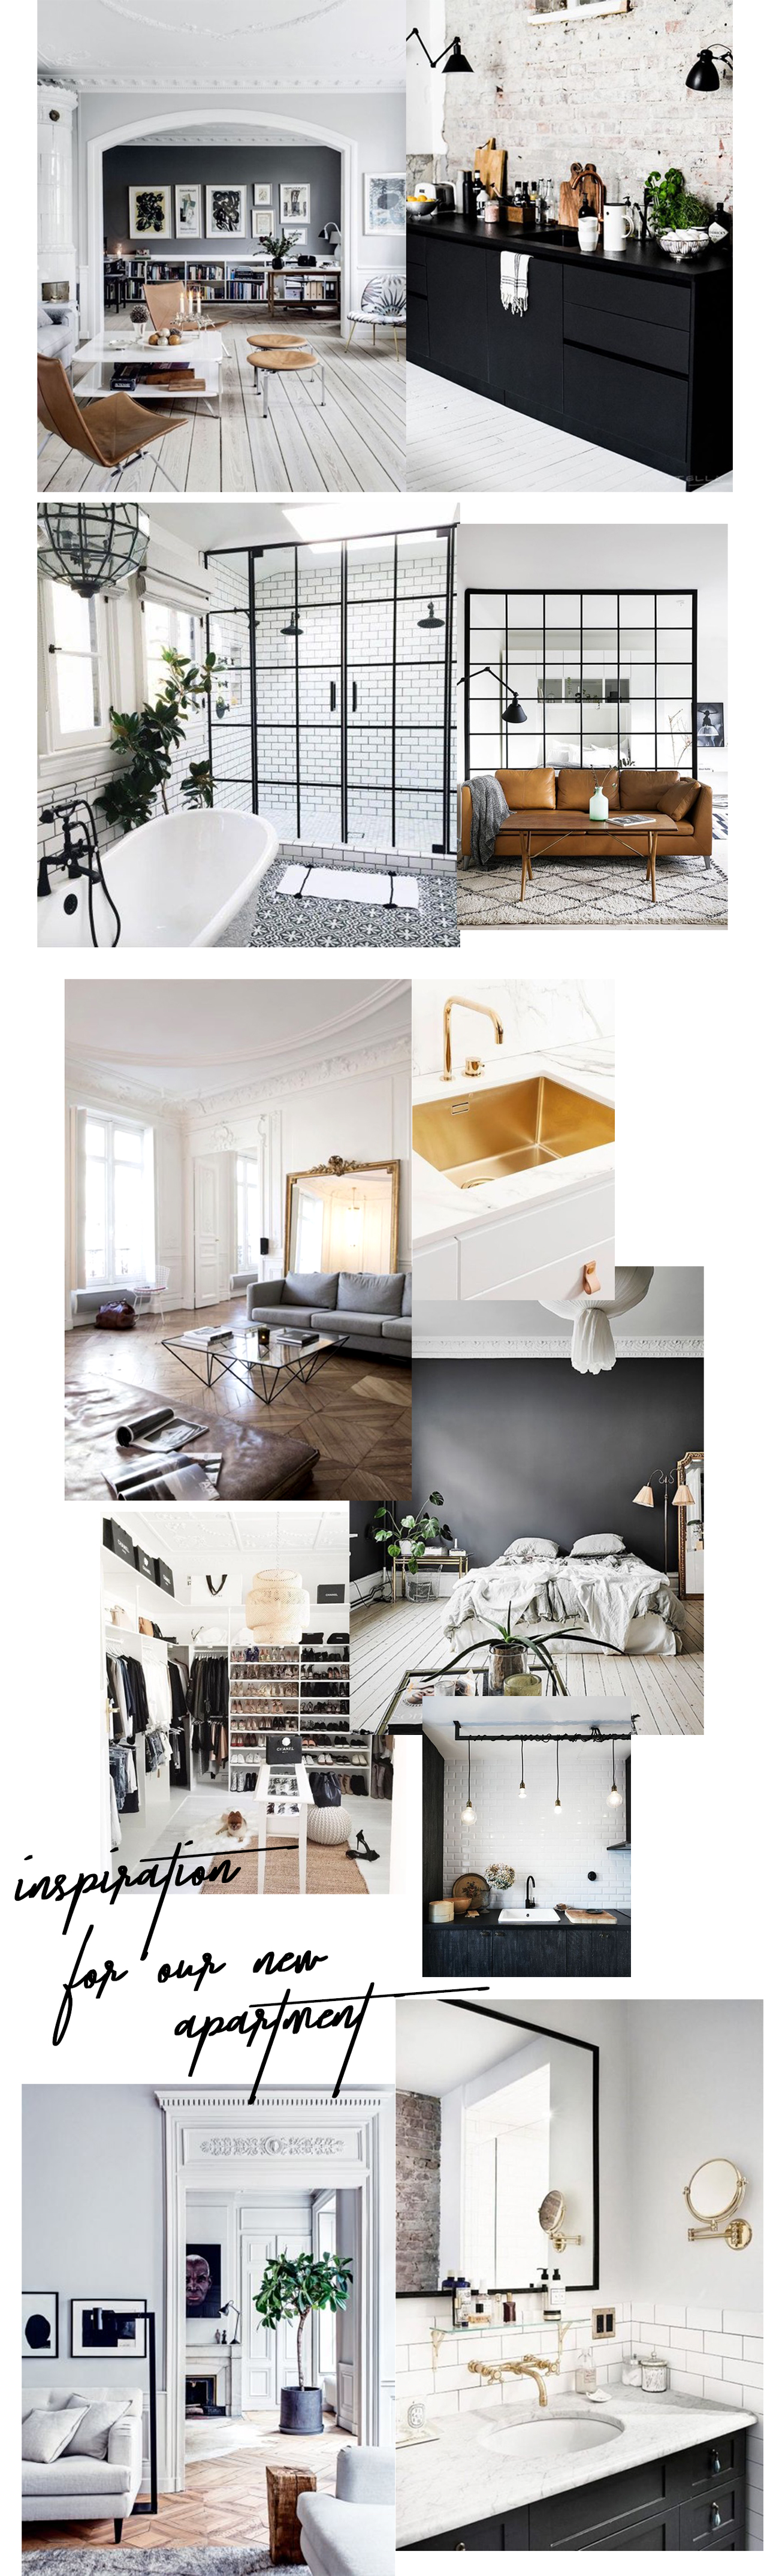 kenza_zouiten_interior_03